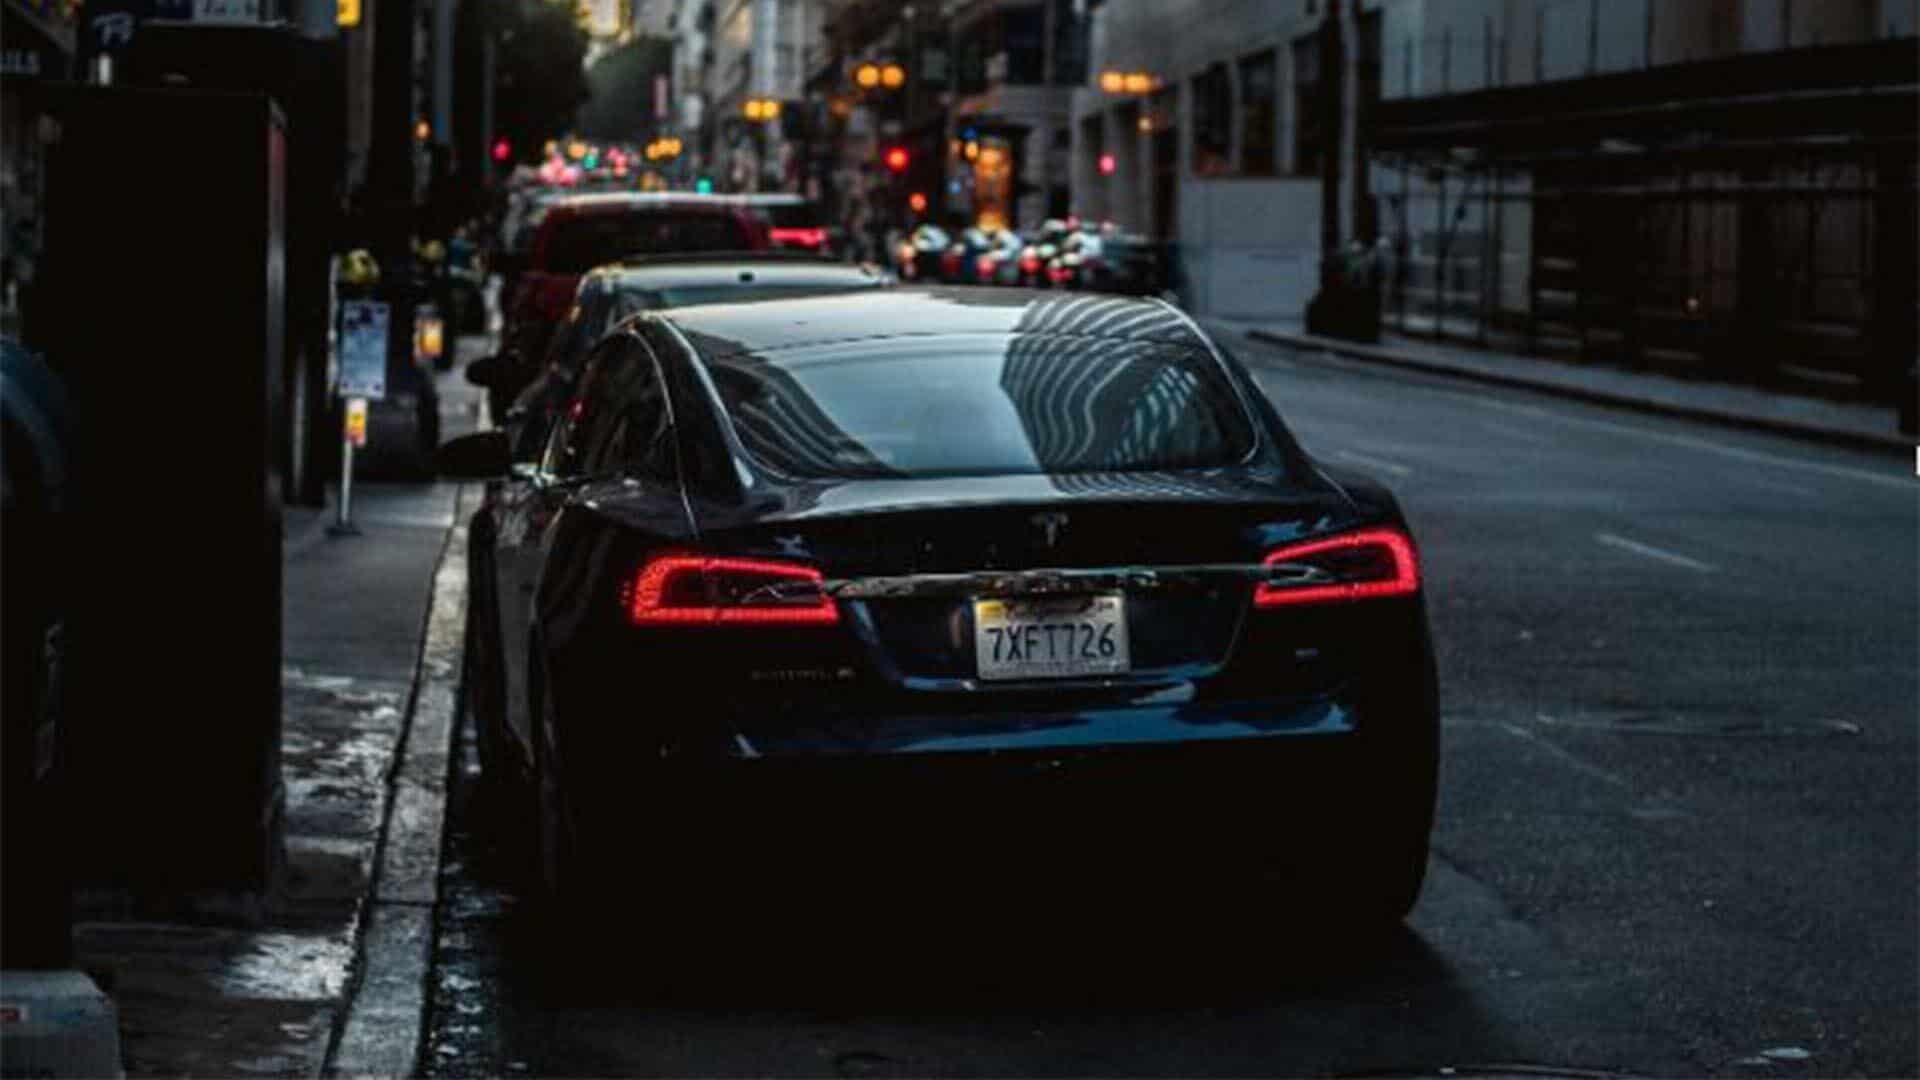 black tesla sitting on street for uber vs lyft pricing post